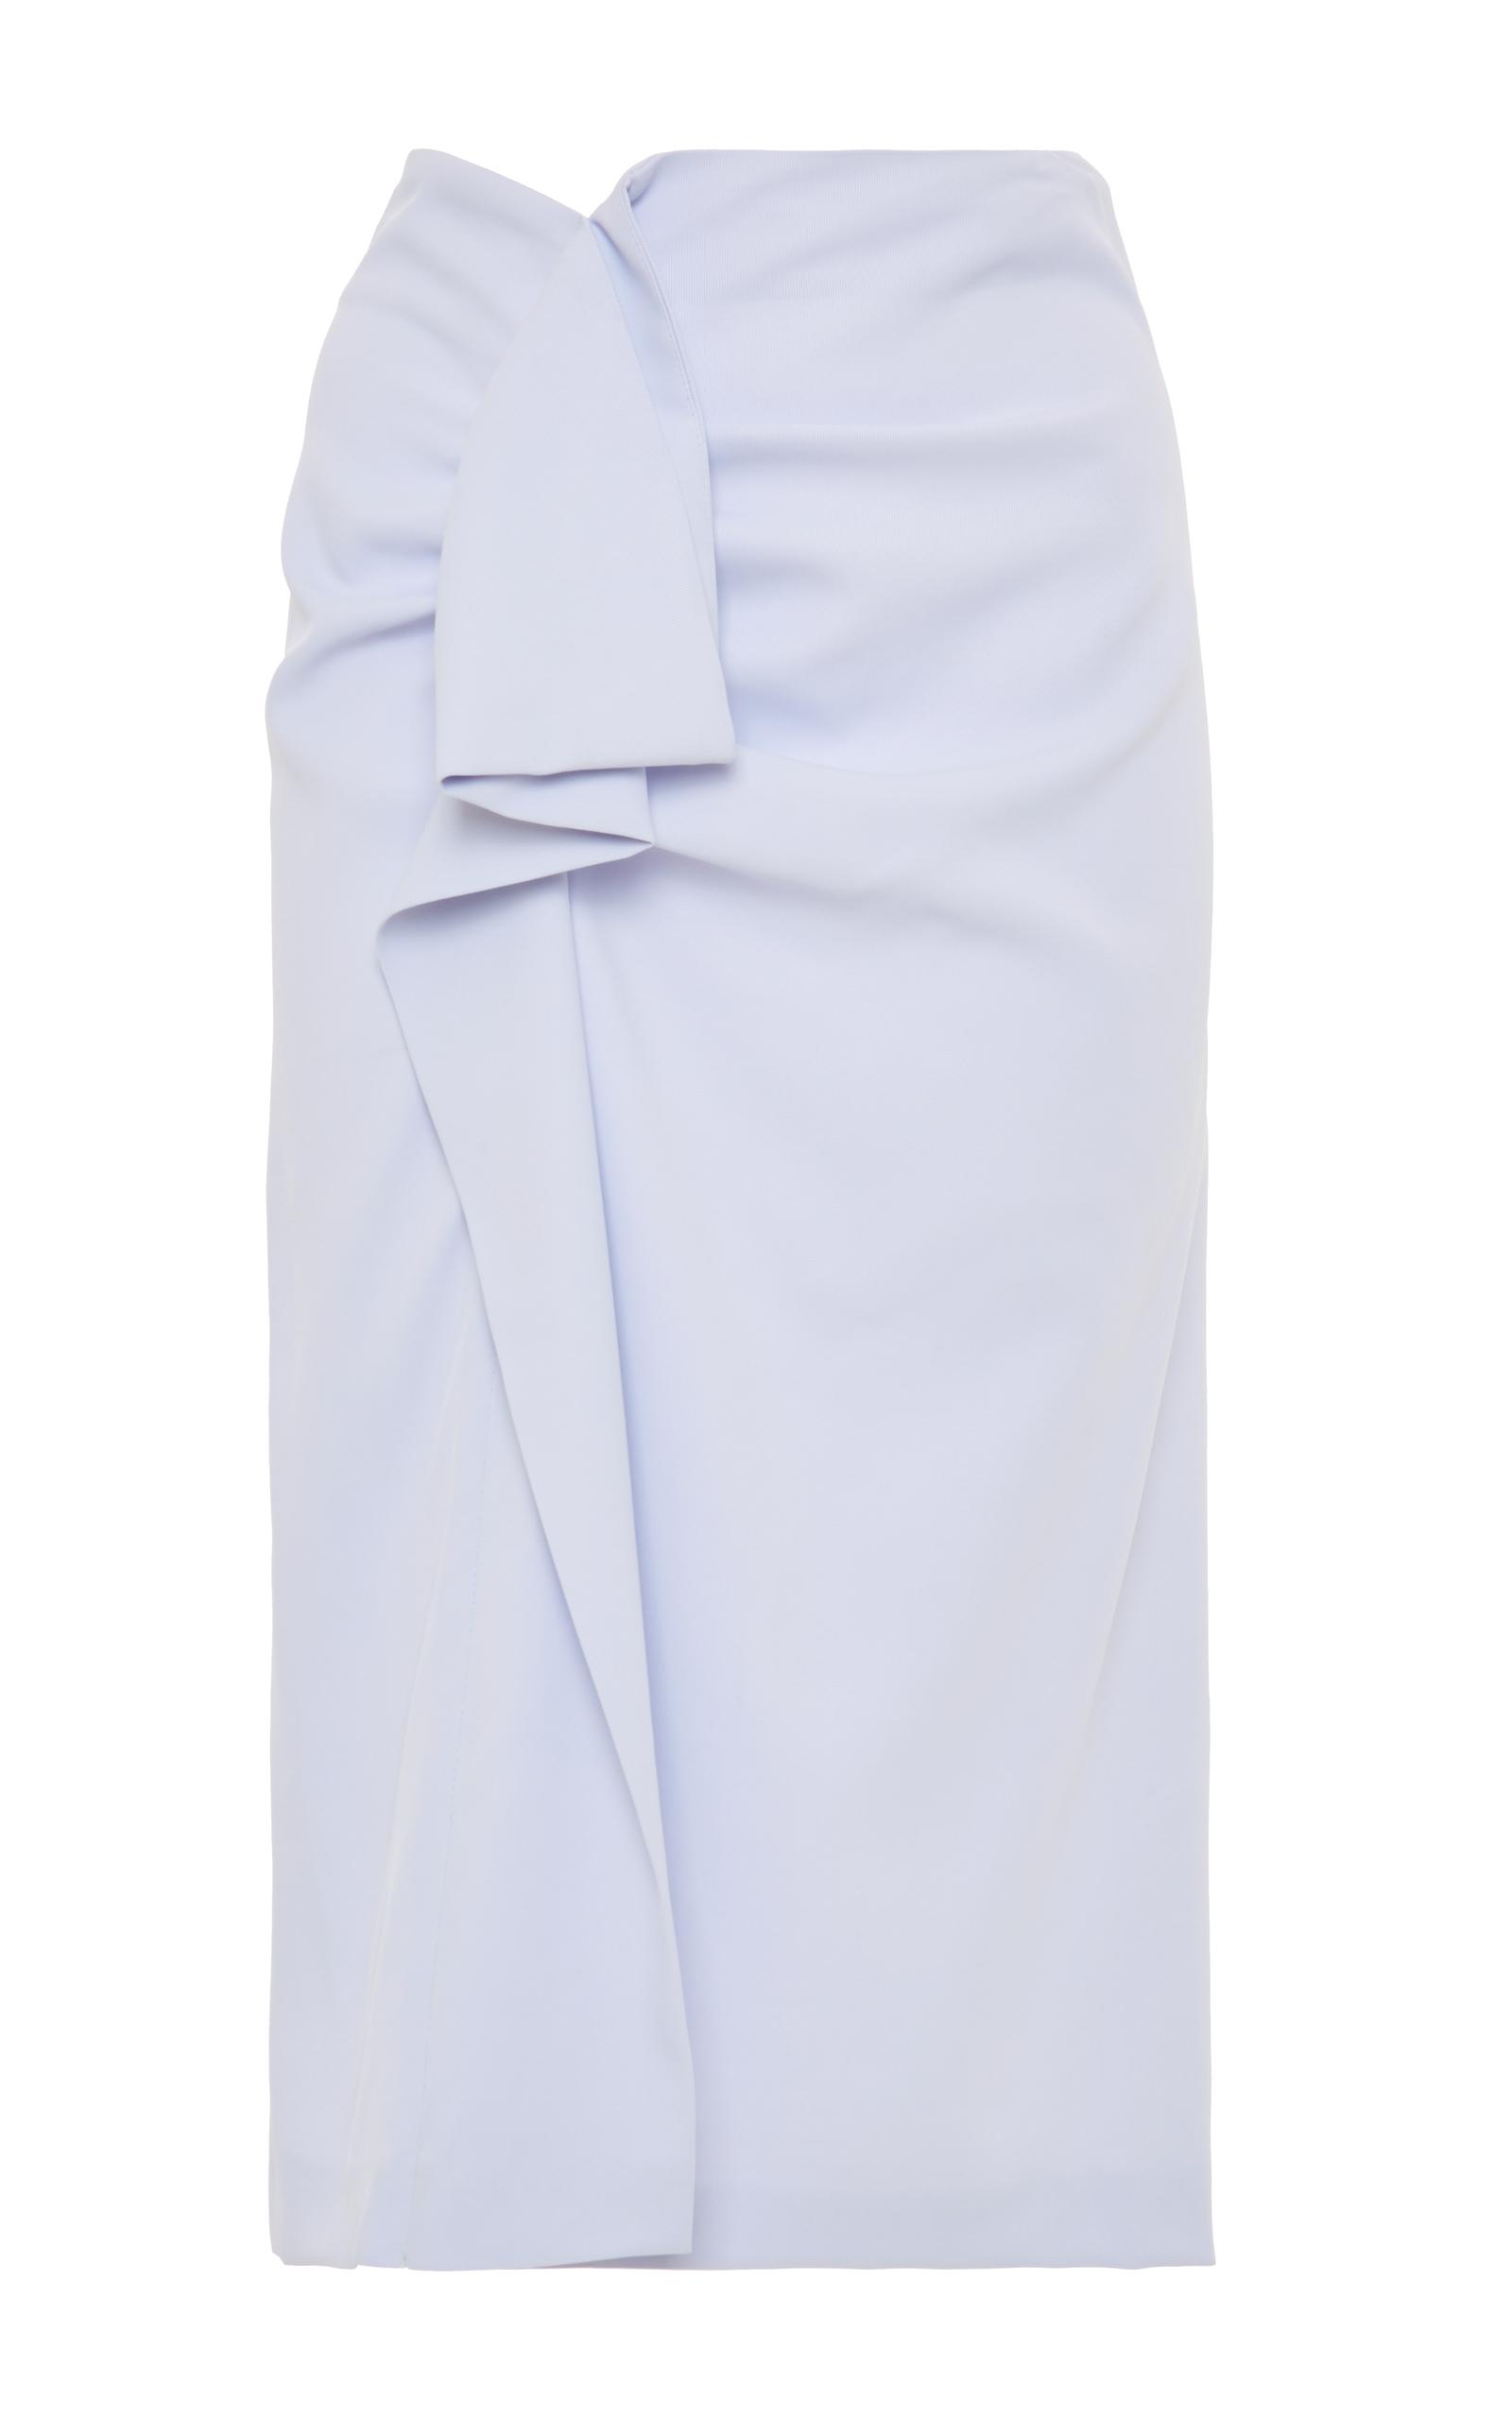 93db419a8 Ruffled Pencil Skirt by Carven   Moda Operandi